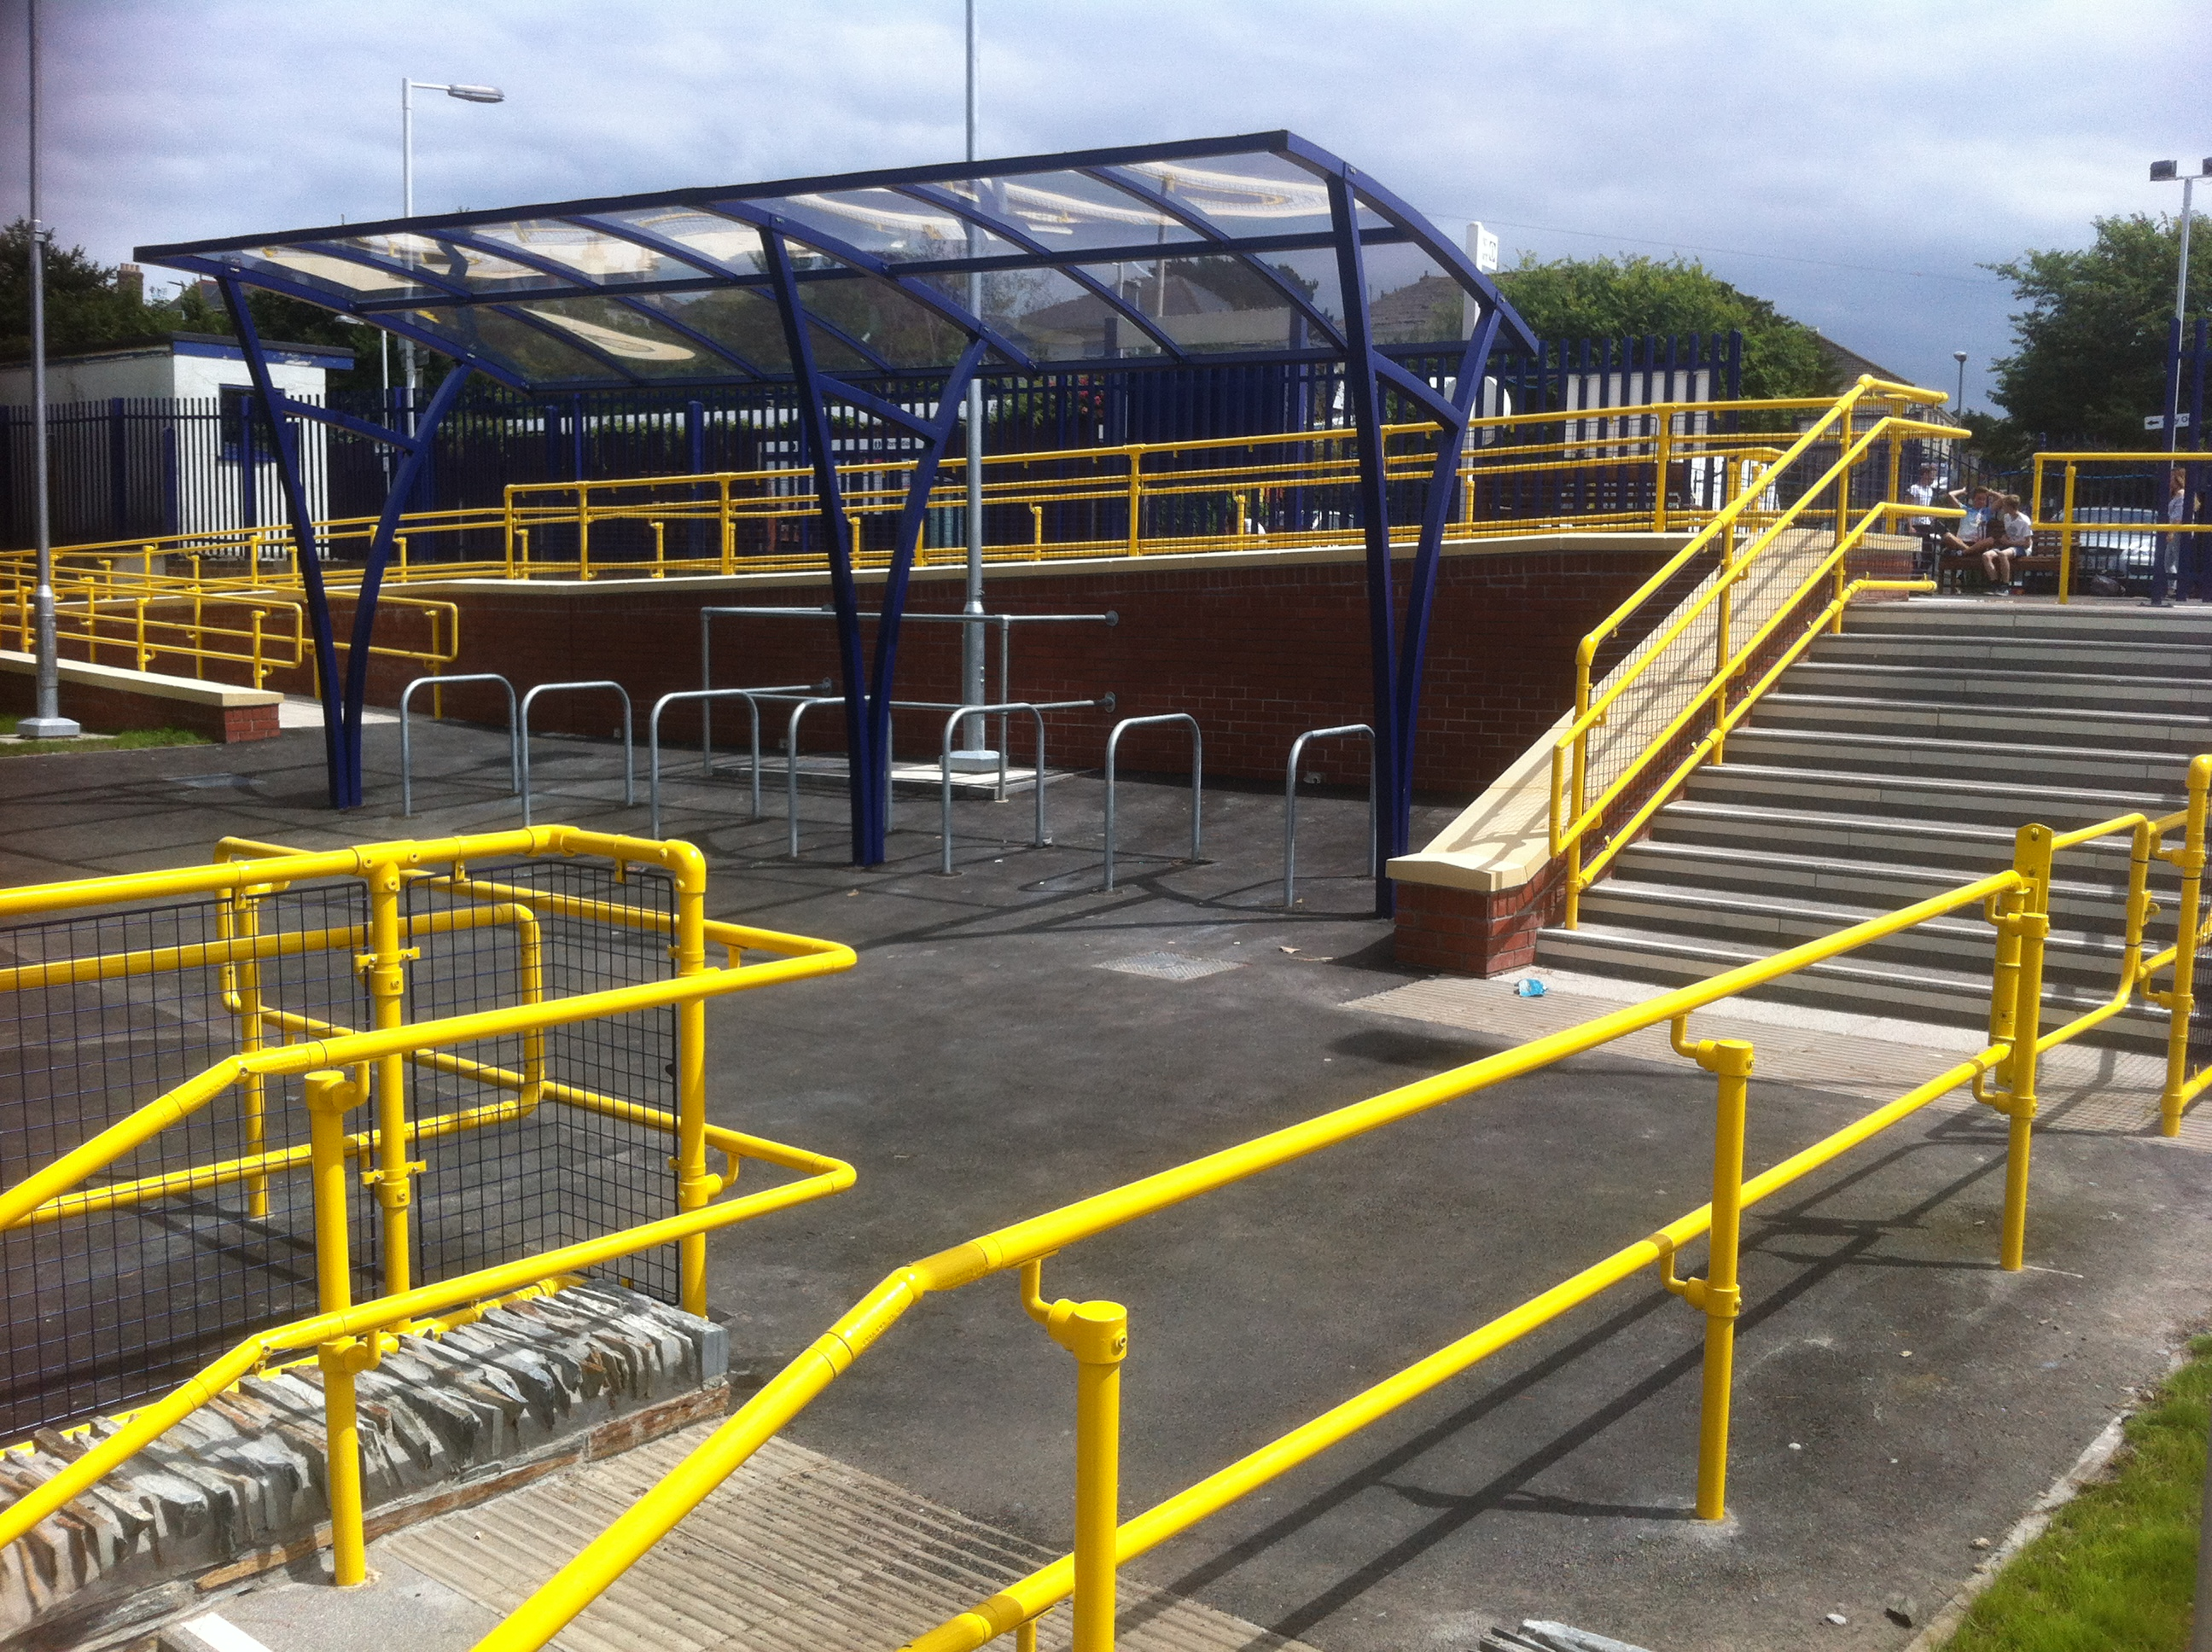 Hayle_Railway_Station.jpg